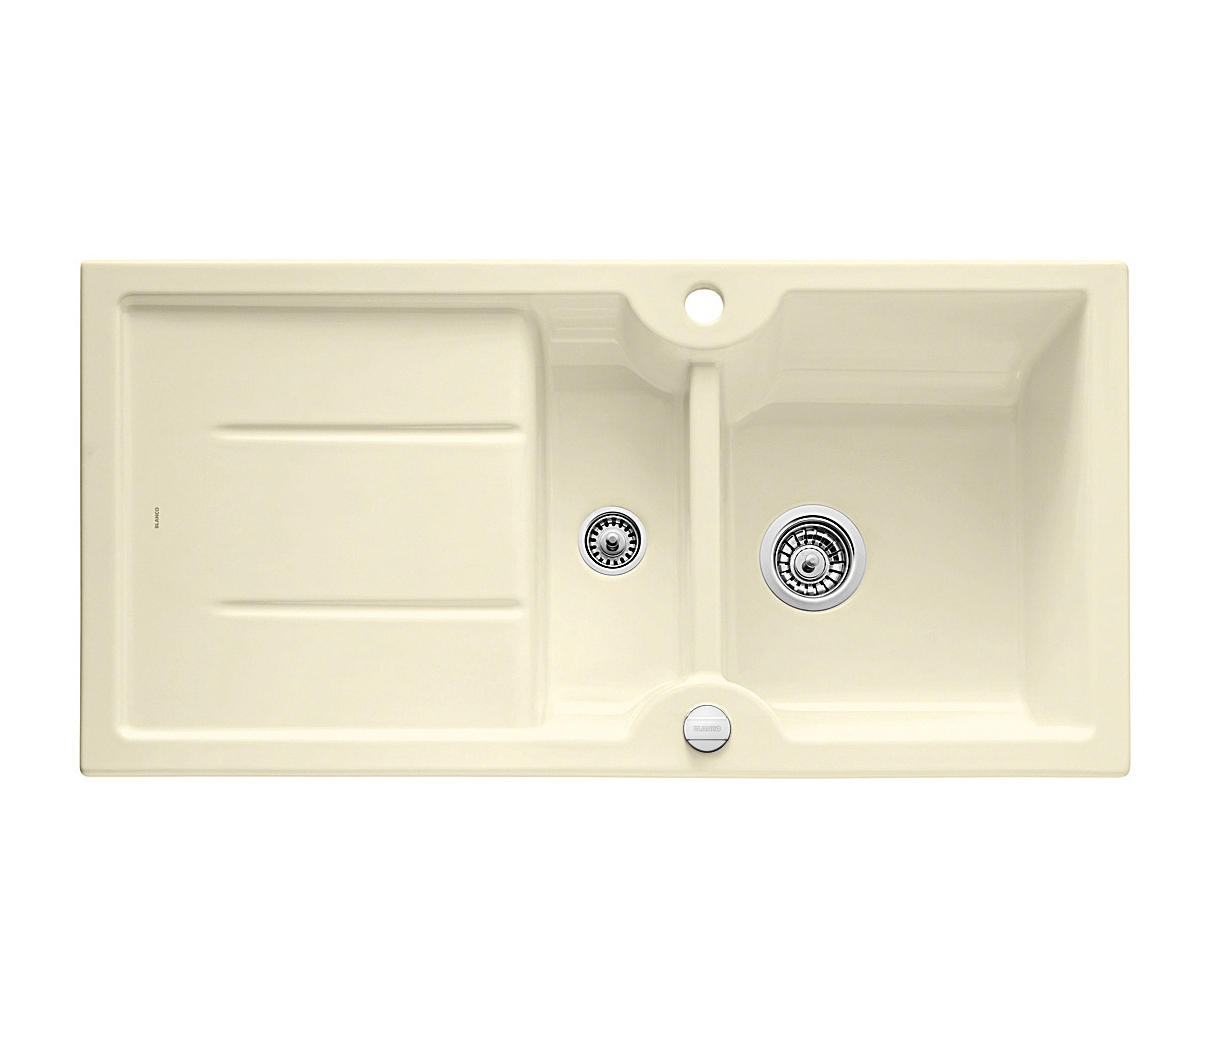 blanco idessa 6 s keramik jasmin k chensp lbecken von blanco architonic. Black Bedroom Furniture Sets. Home Design Ideas